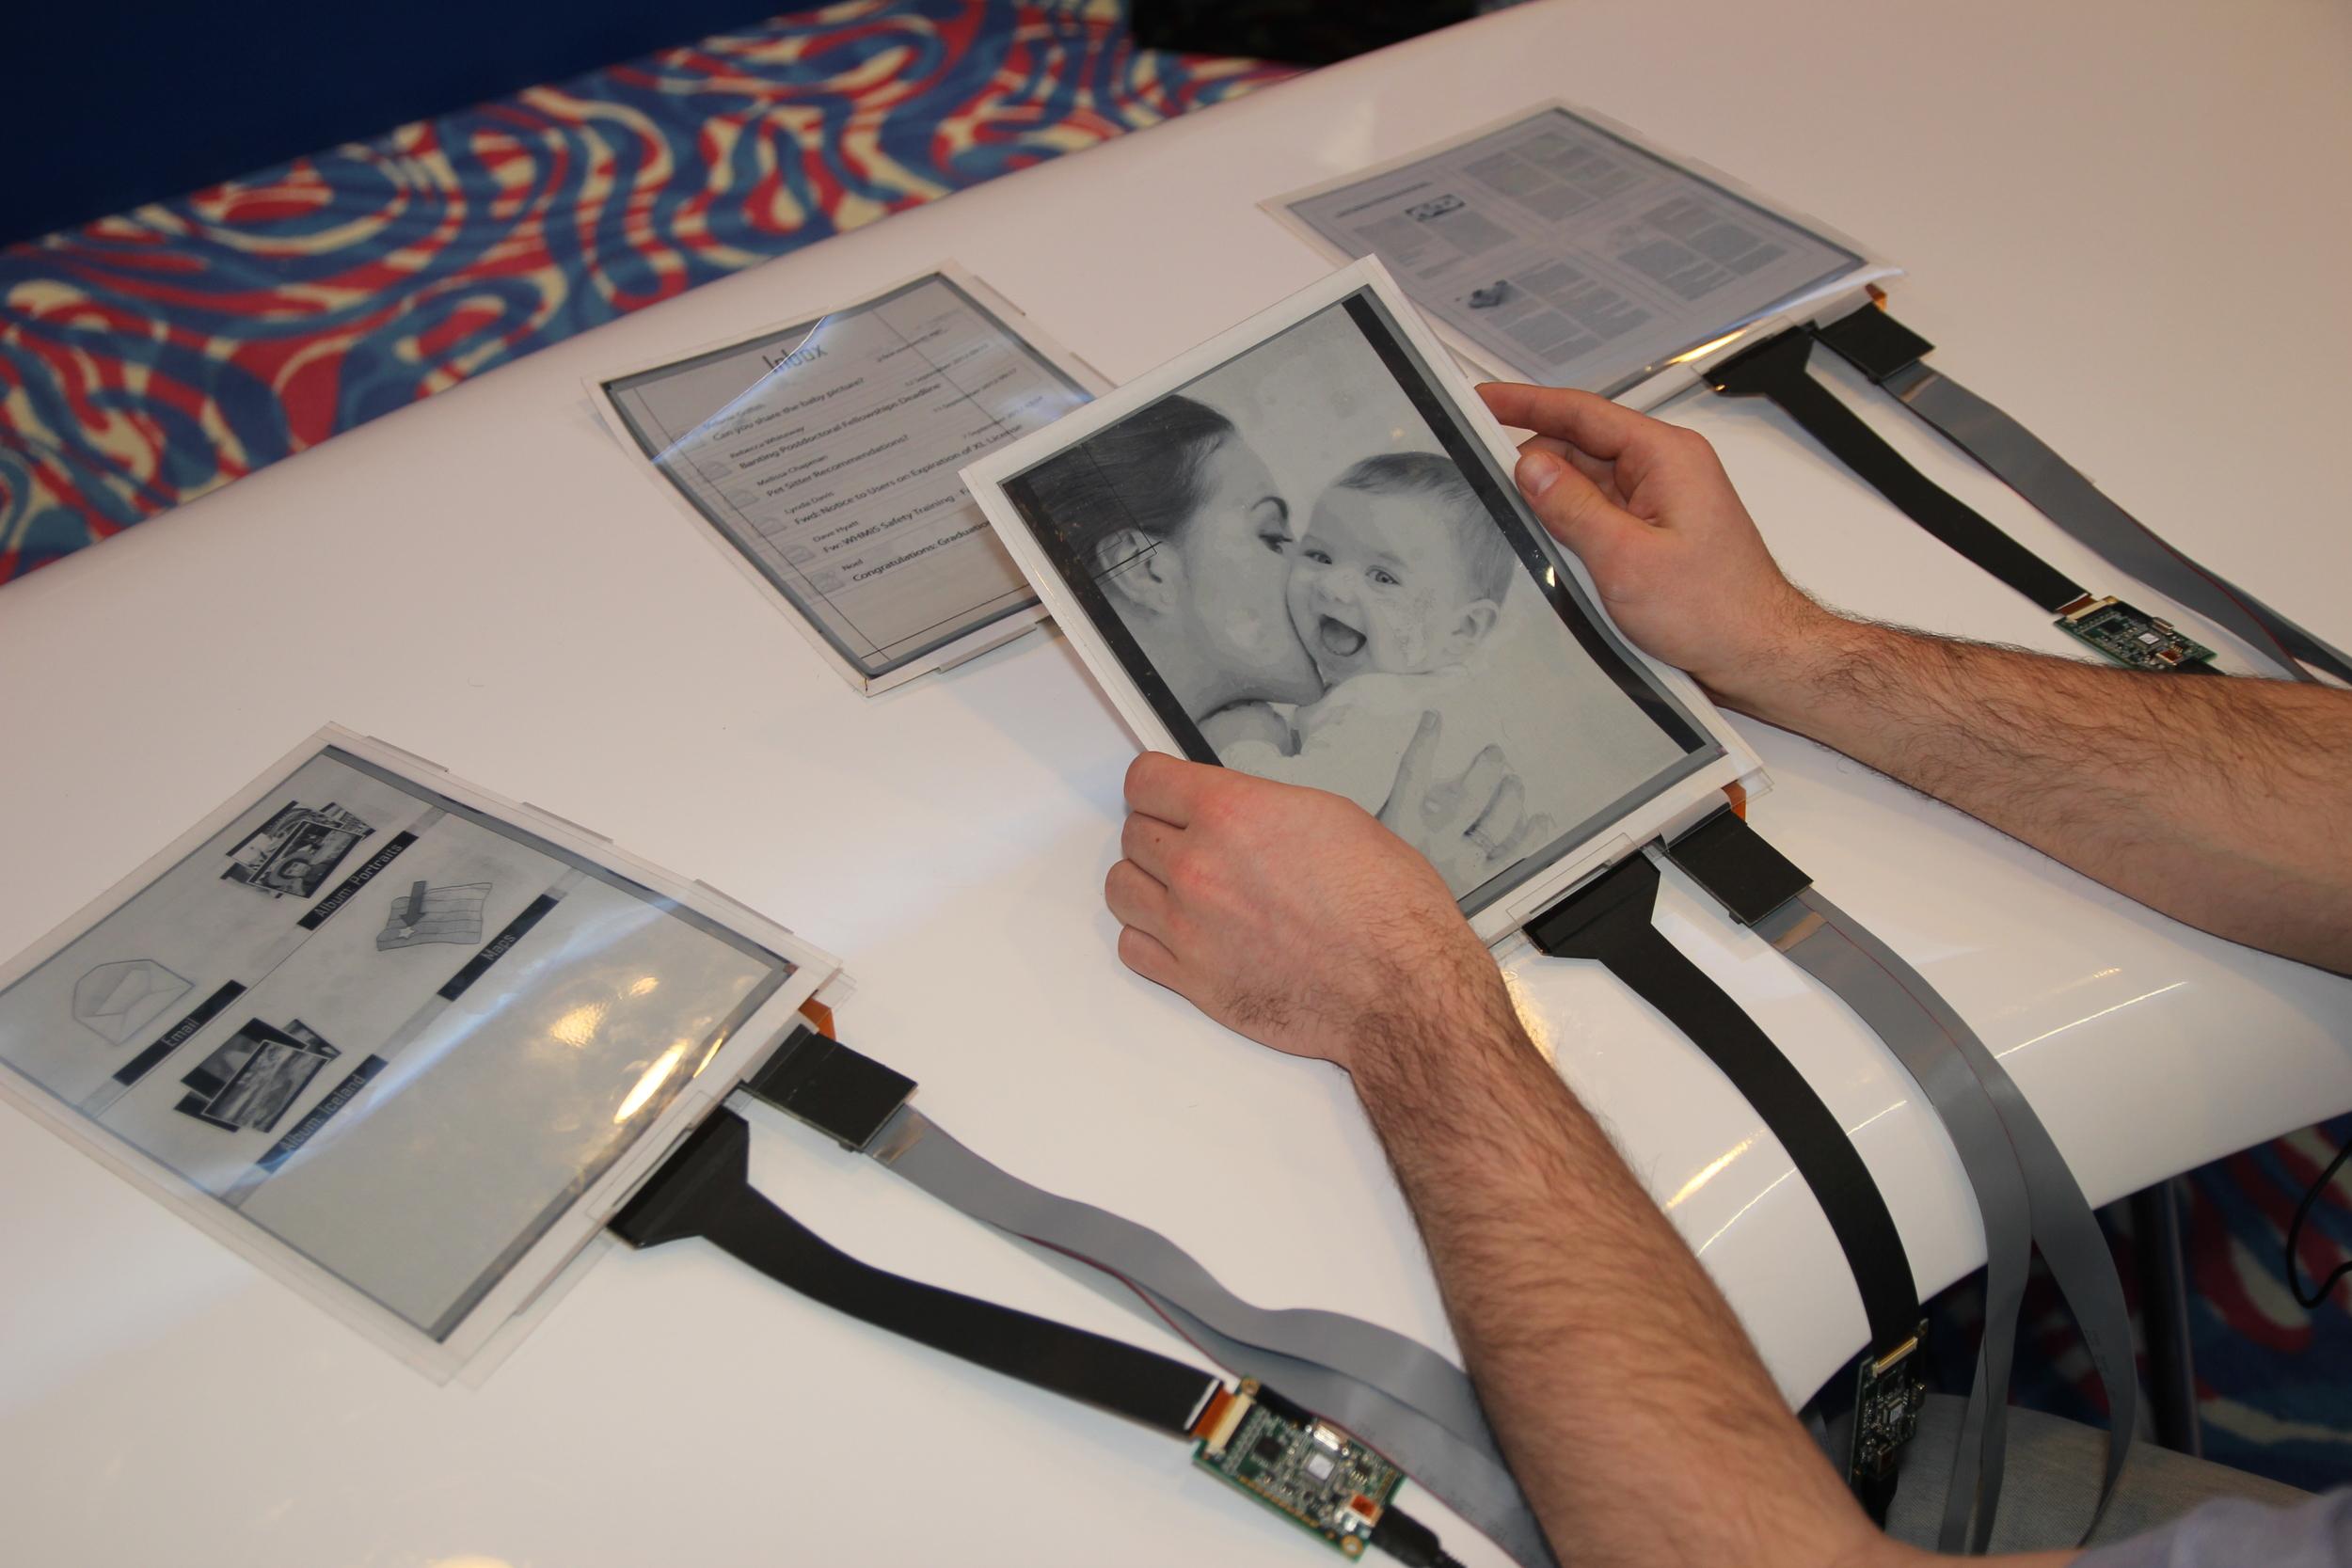 papertab (2012) first flexible tablet pcs